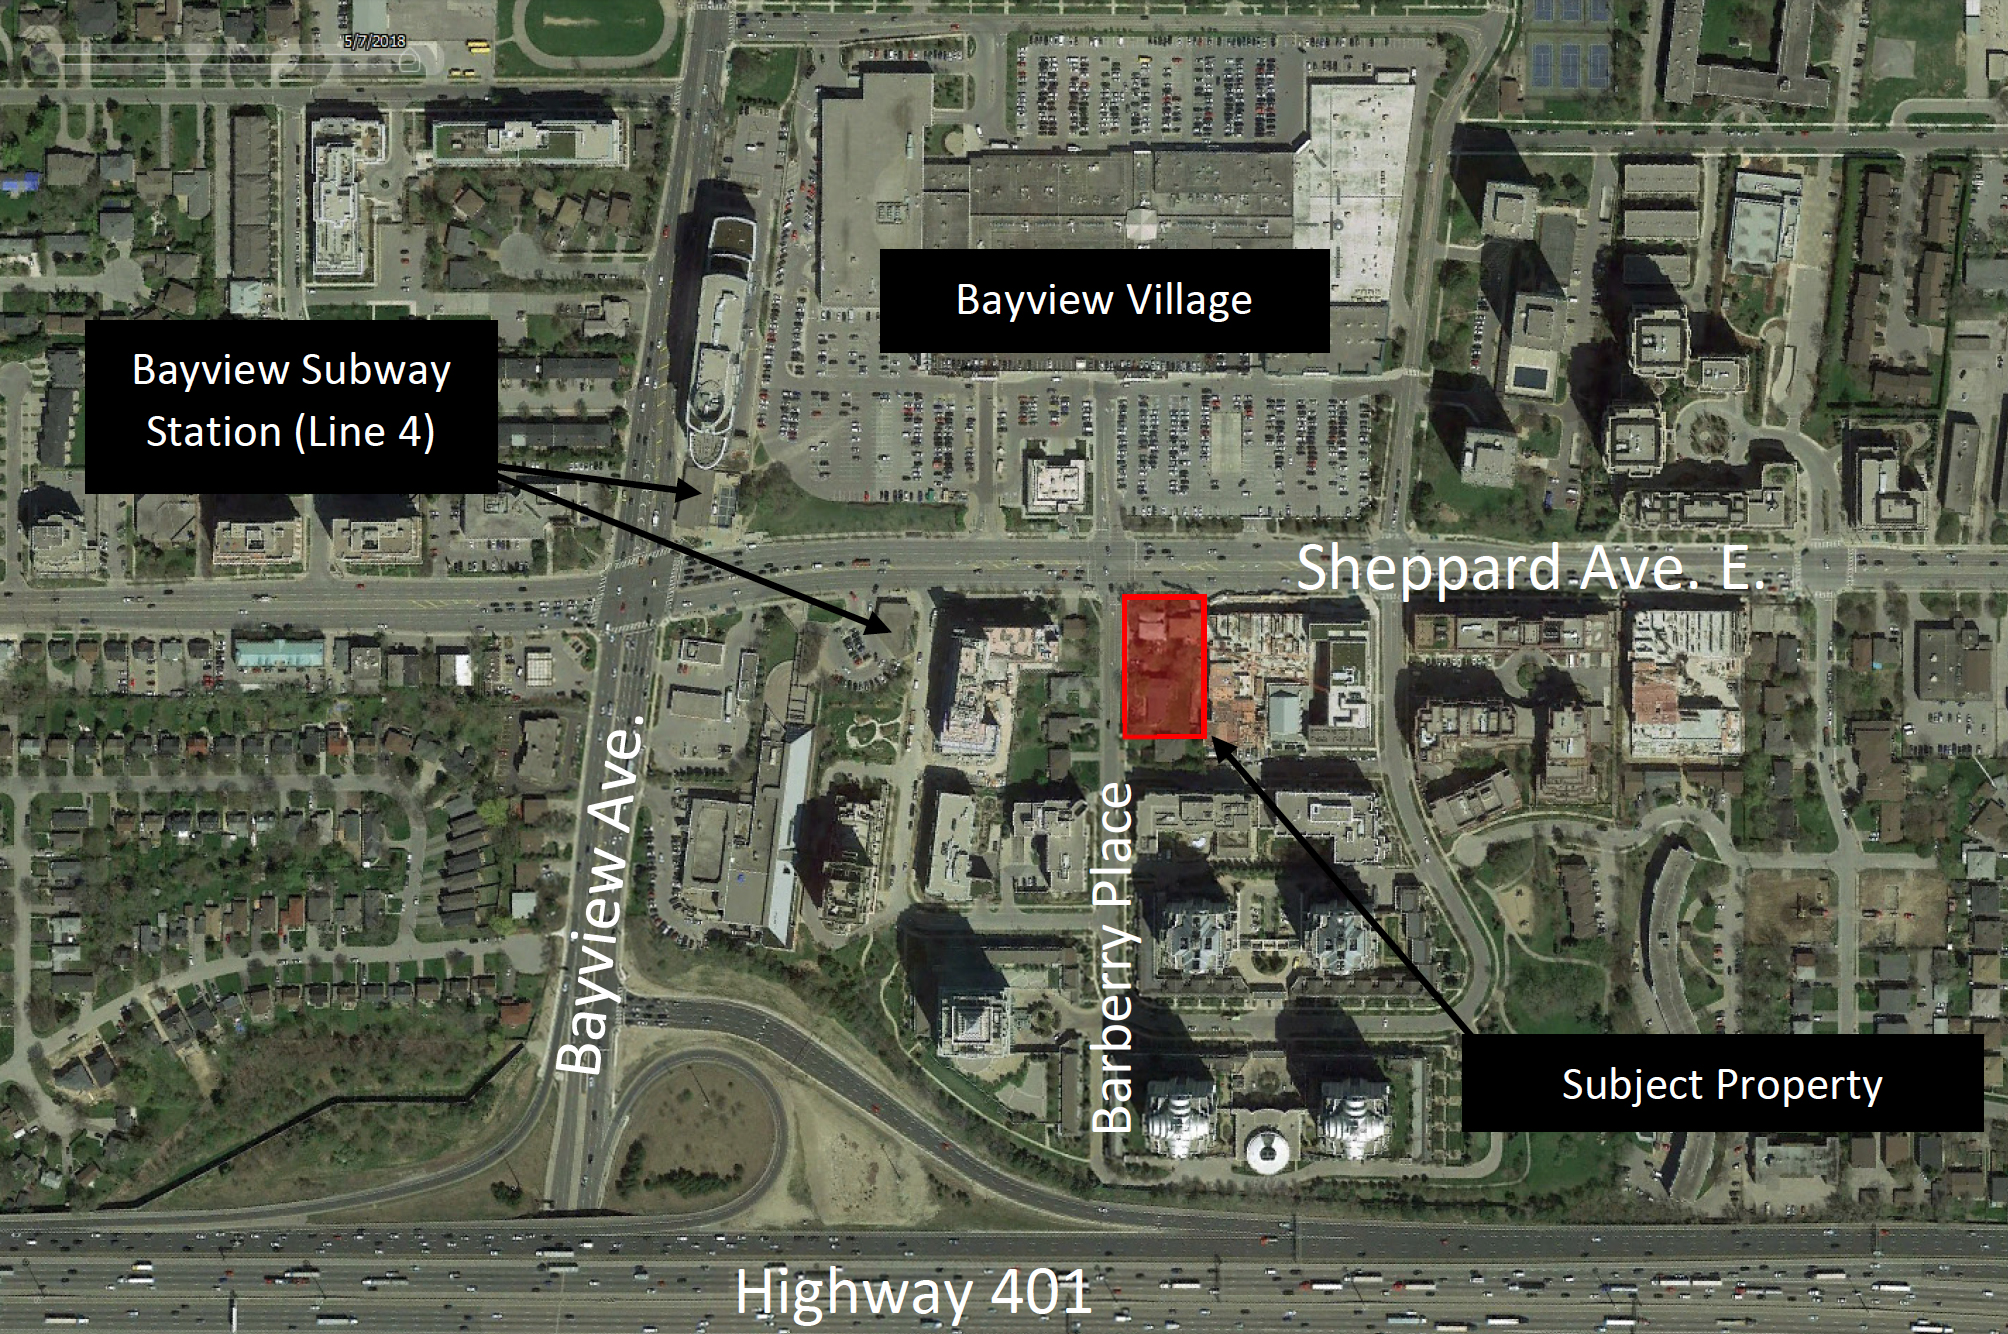 589 Sheppard Avenue East, Toronto, designed by RAW Design for JFJ Development Inc.